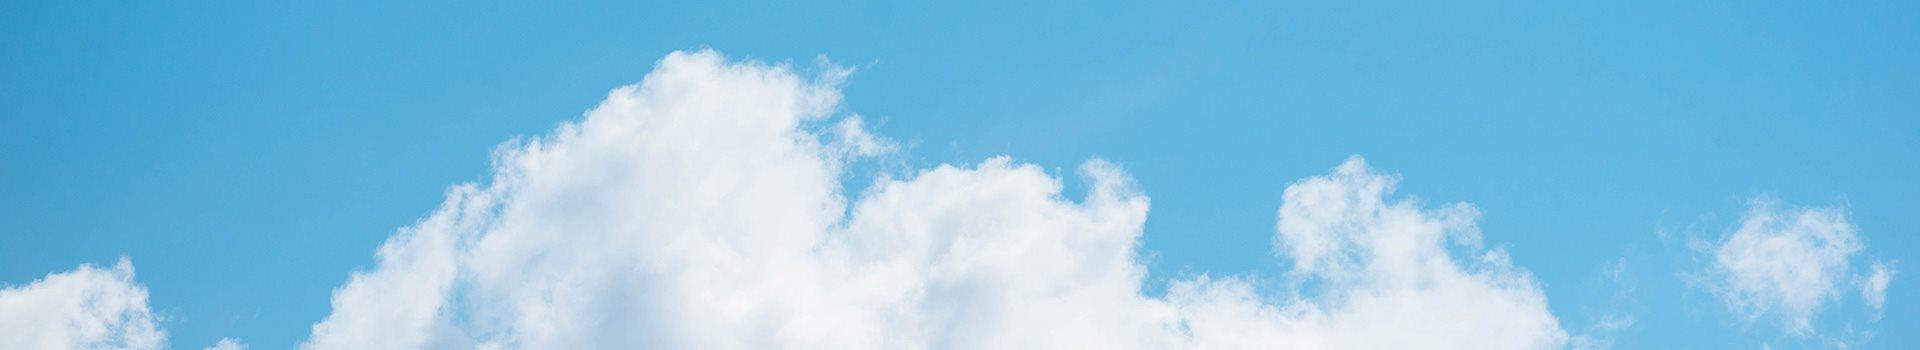 Brilliant Sunny Sky at Pacifica Senior Living South Coast, Costa Mesa, California